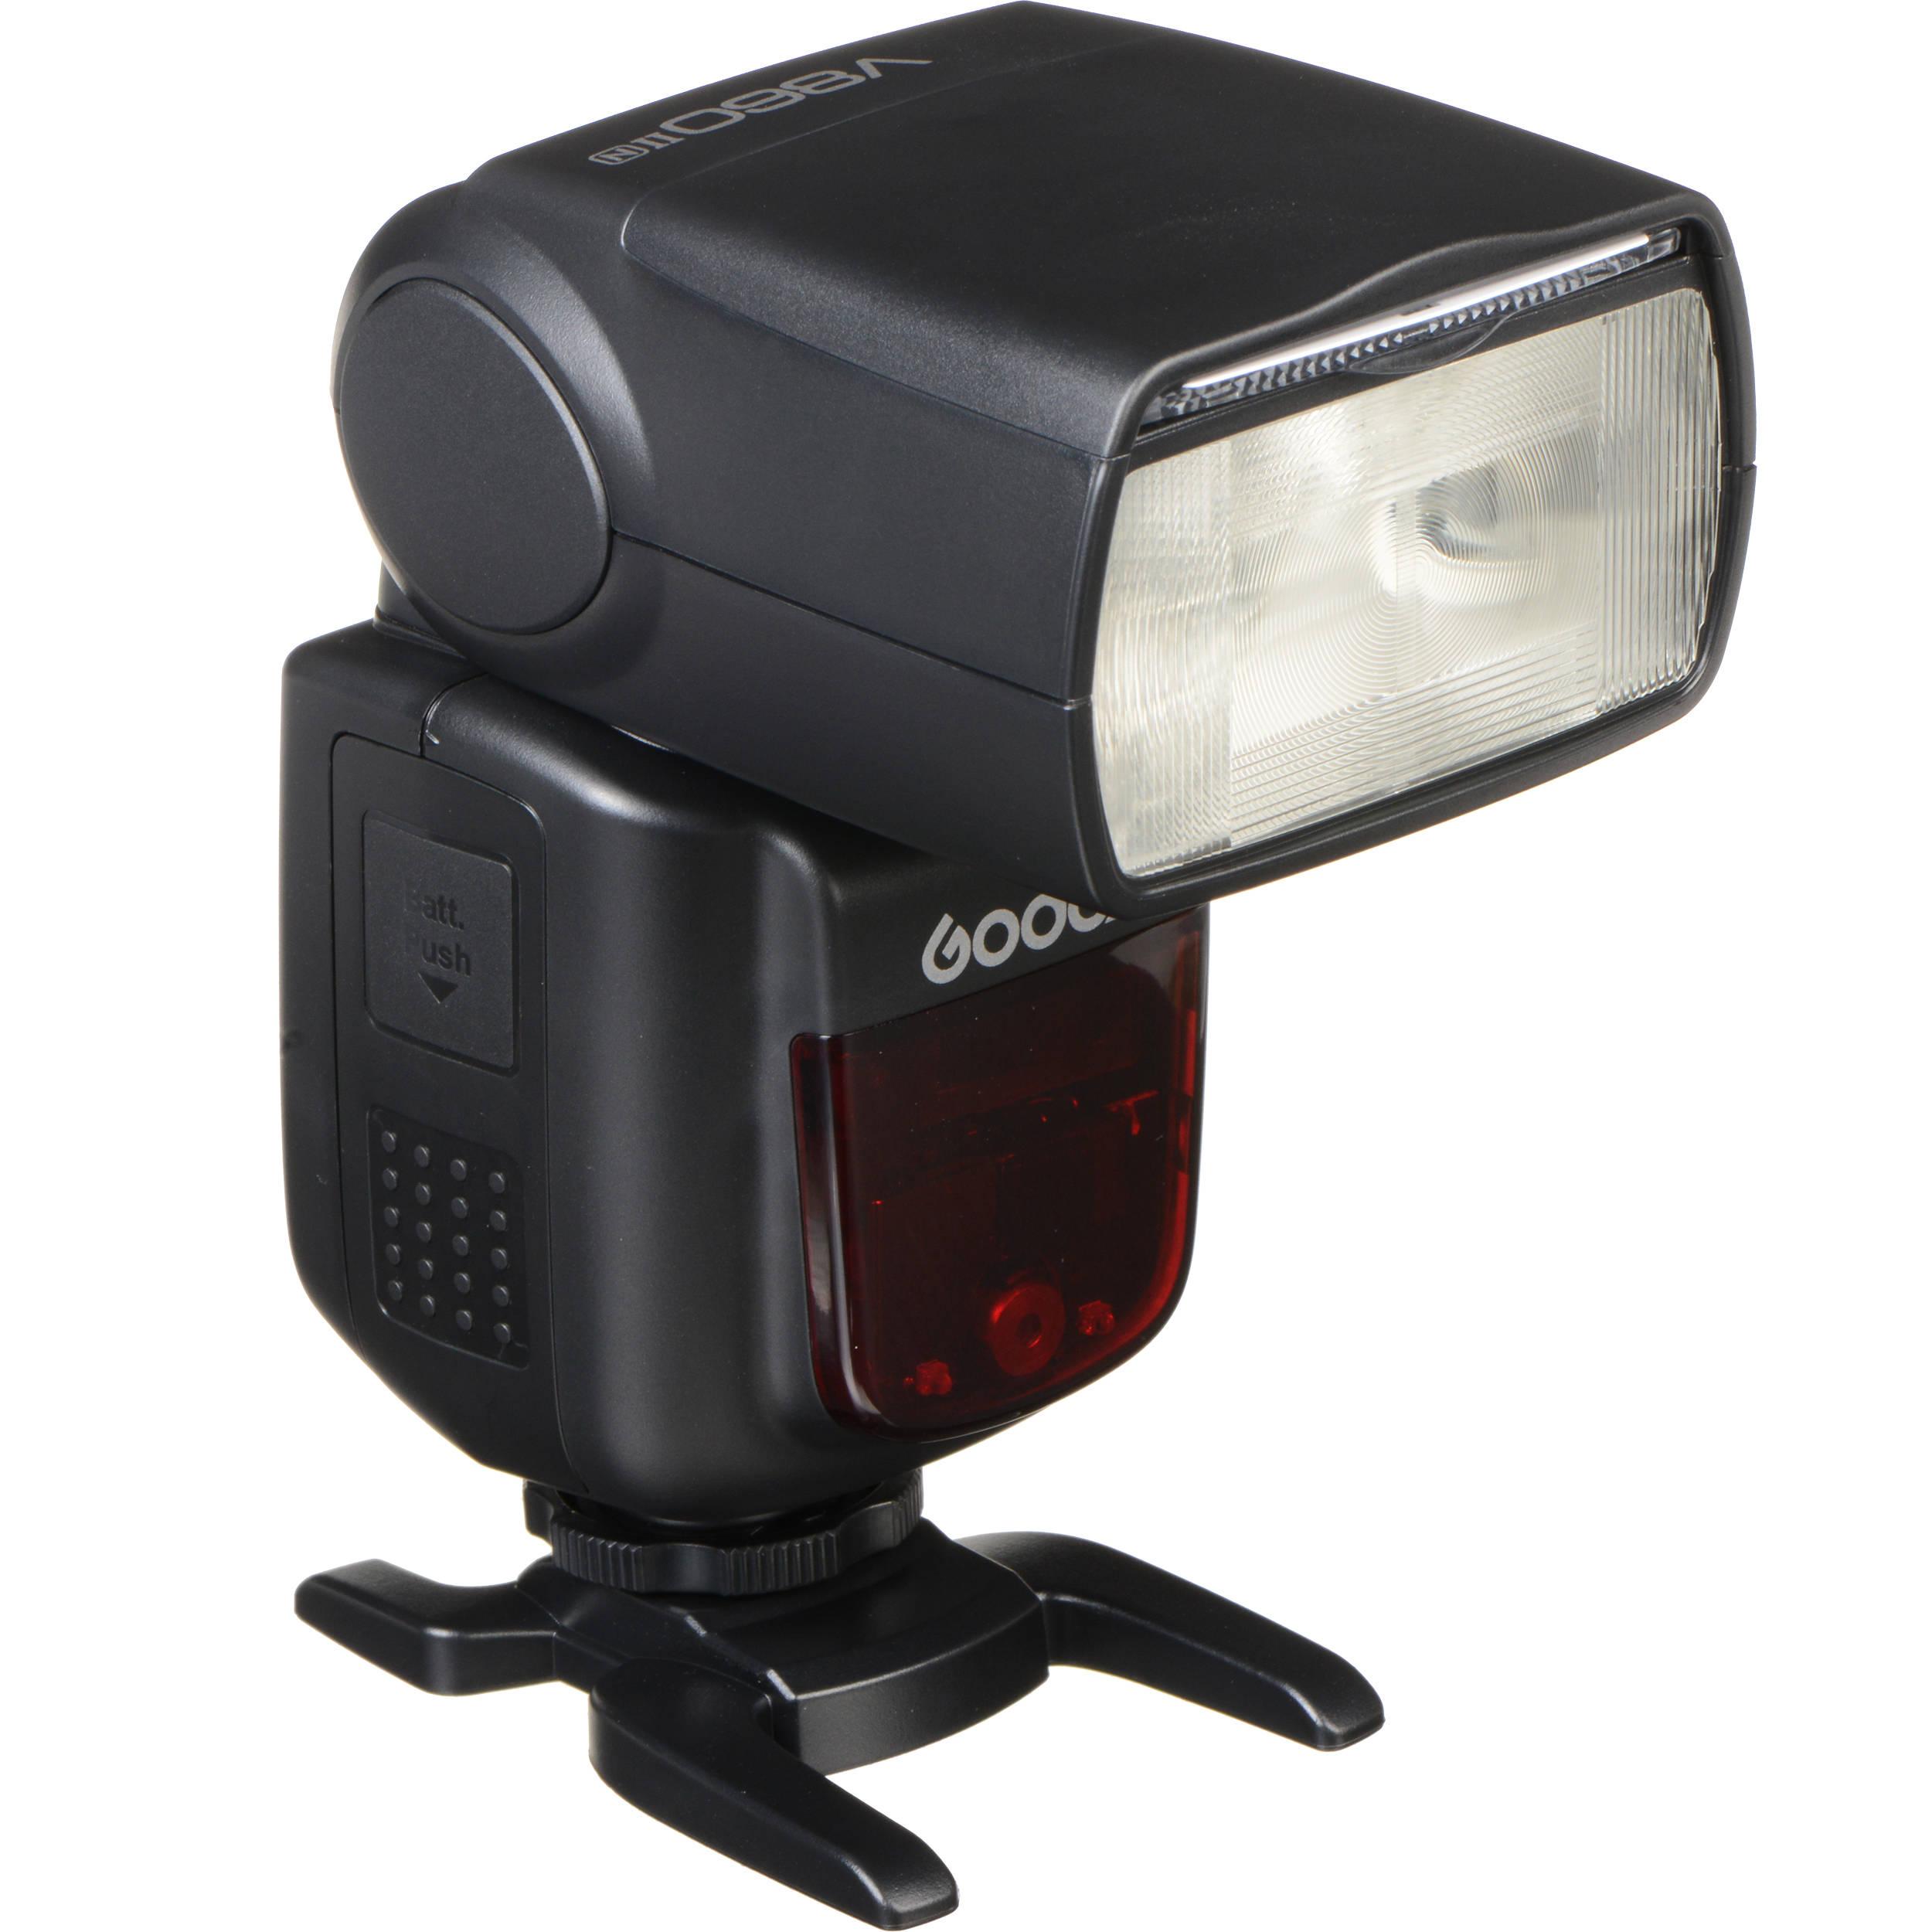 Nikon sb 910 bh photo video godox ving v860iin ttl li ion flash kit for nikon cameras baditri Images